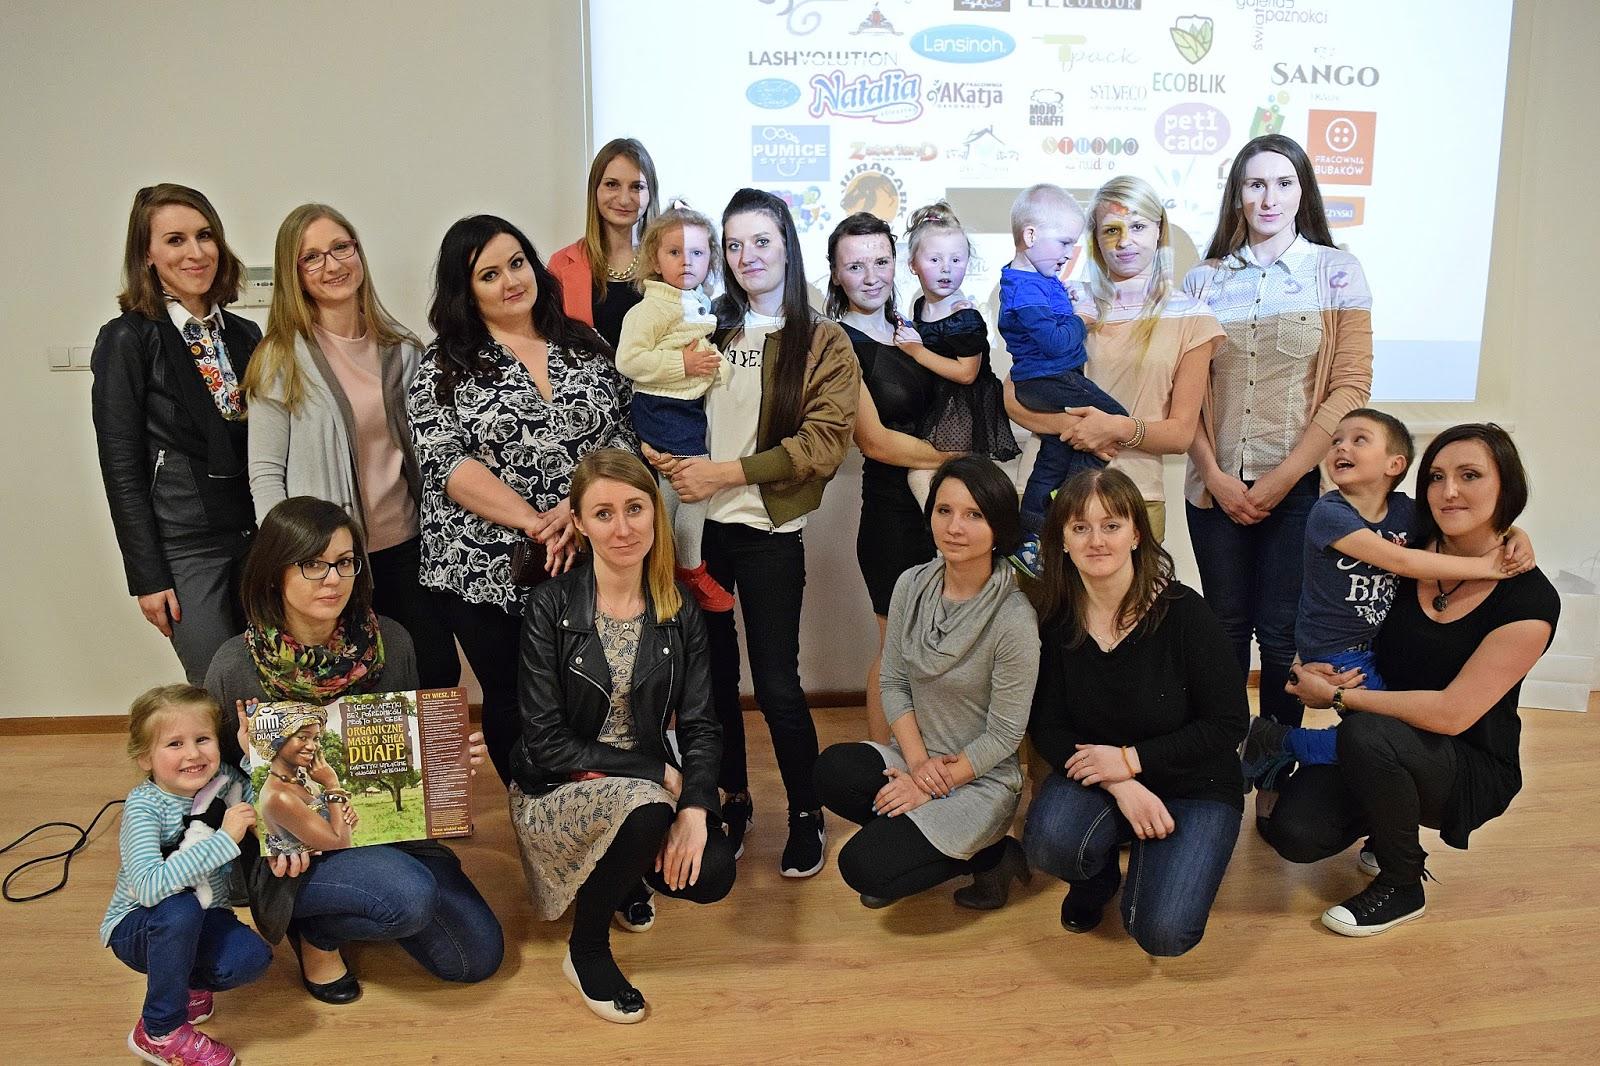 Spotkanie blogerek Lublin 09.04.2016r. - fotorelacja!